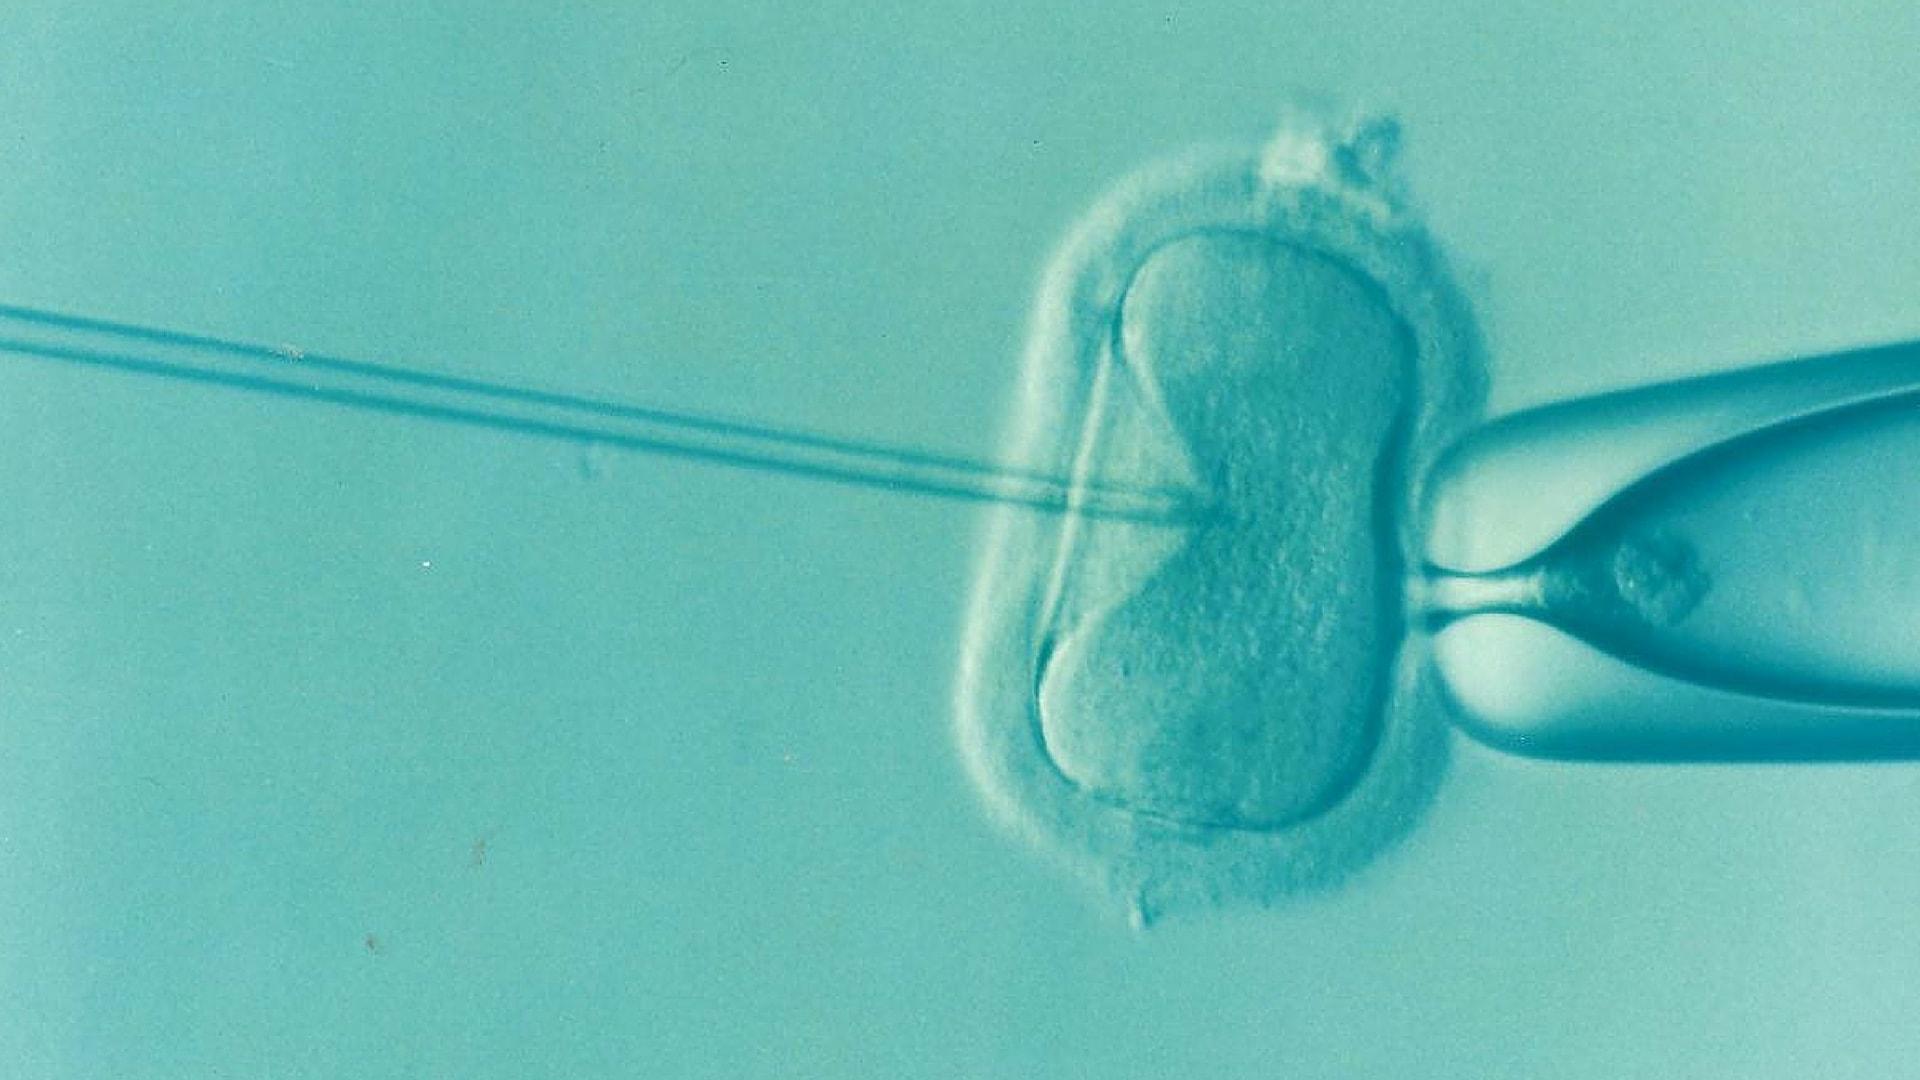 fecondation-in-vitro-fiv-2 - Trust My Science